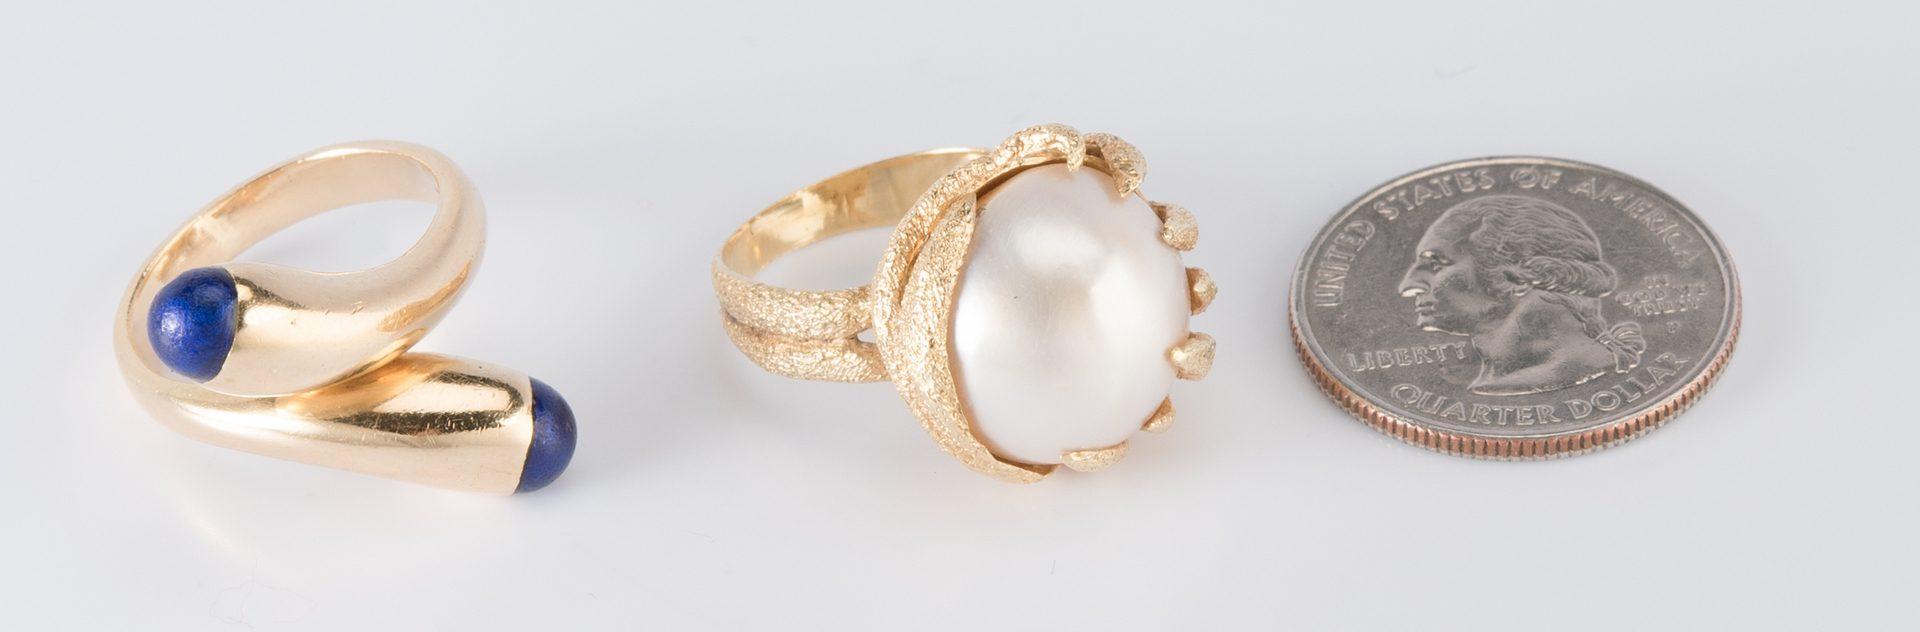 Lot 321: Two 18K Fashion Rings